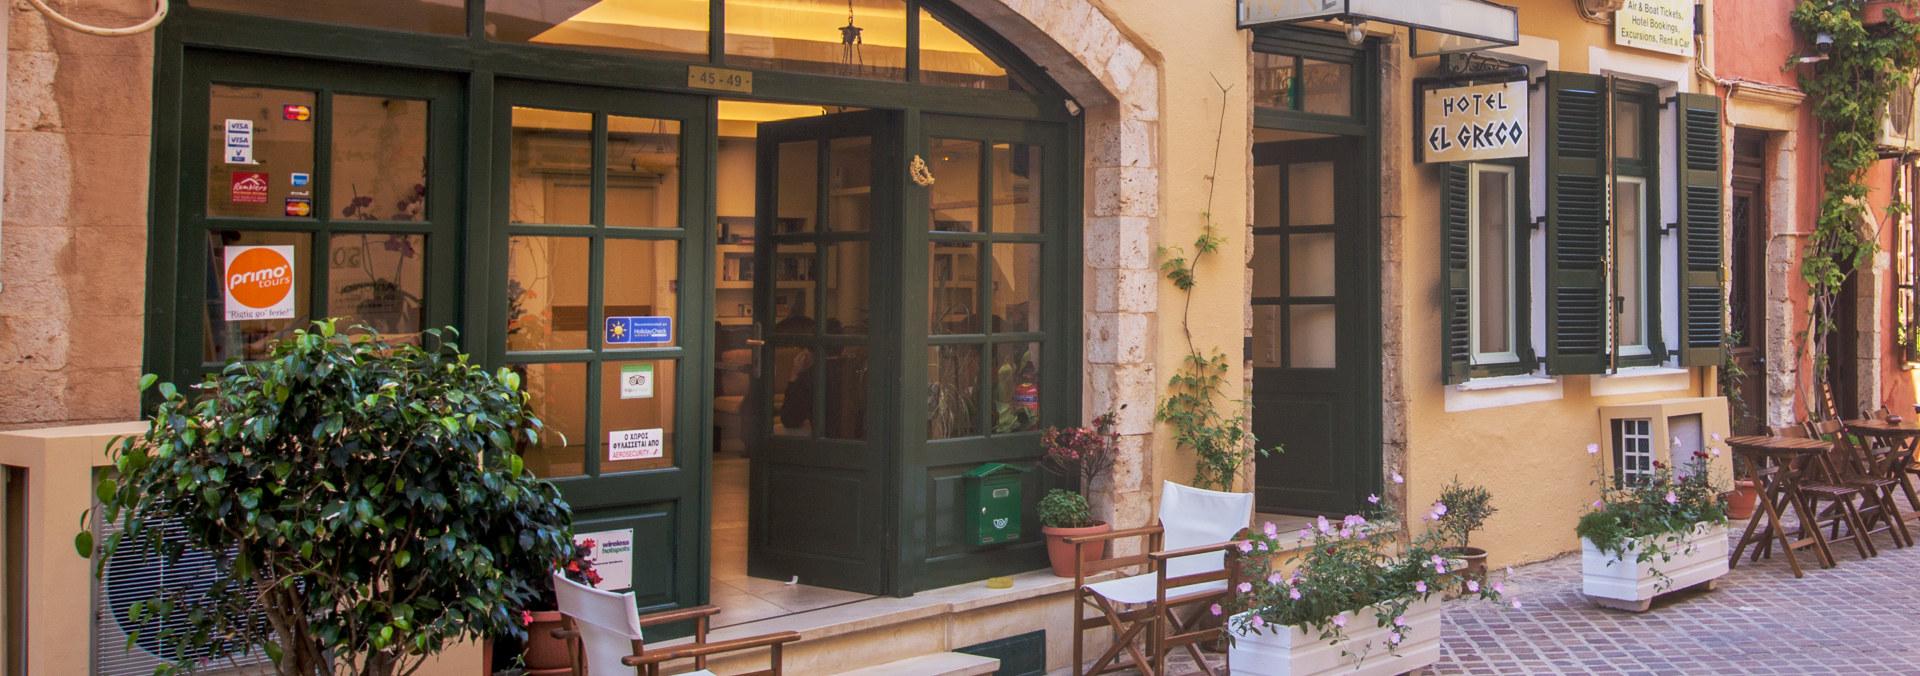 Access & Sightseeings - El Greco Hotel